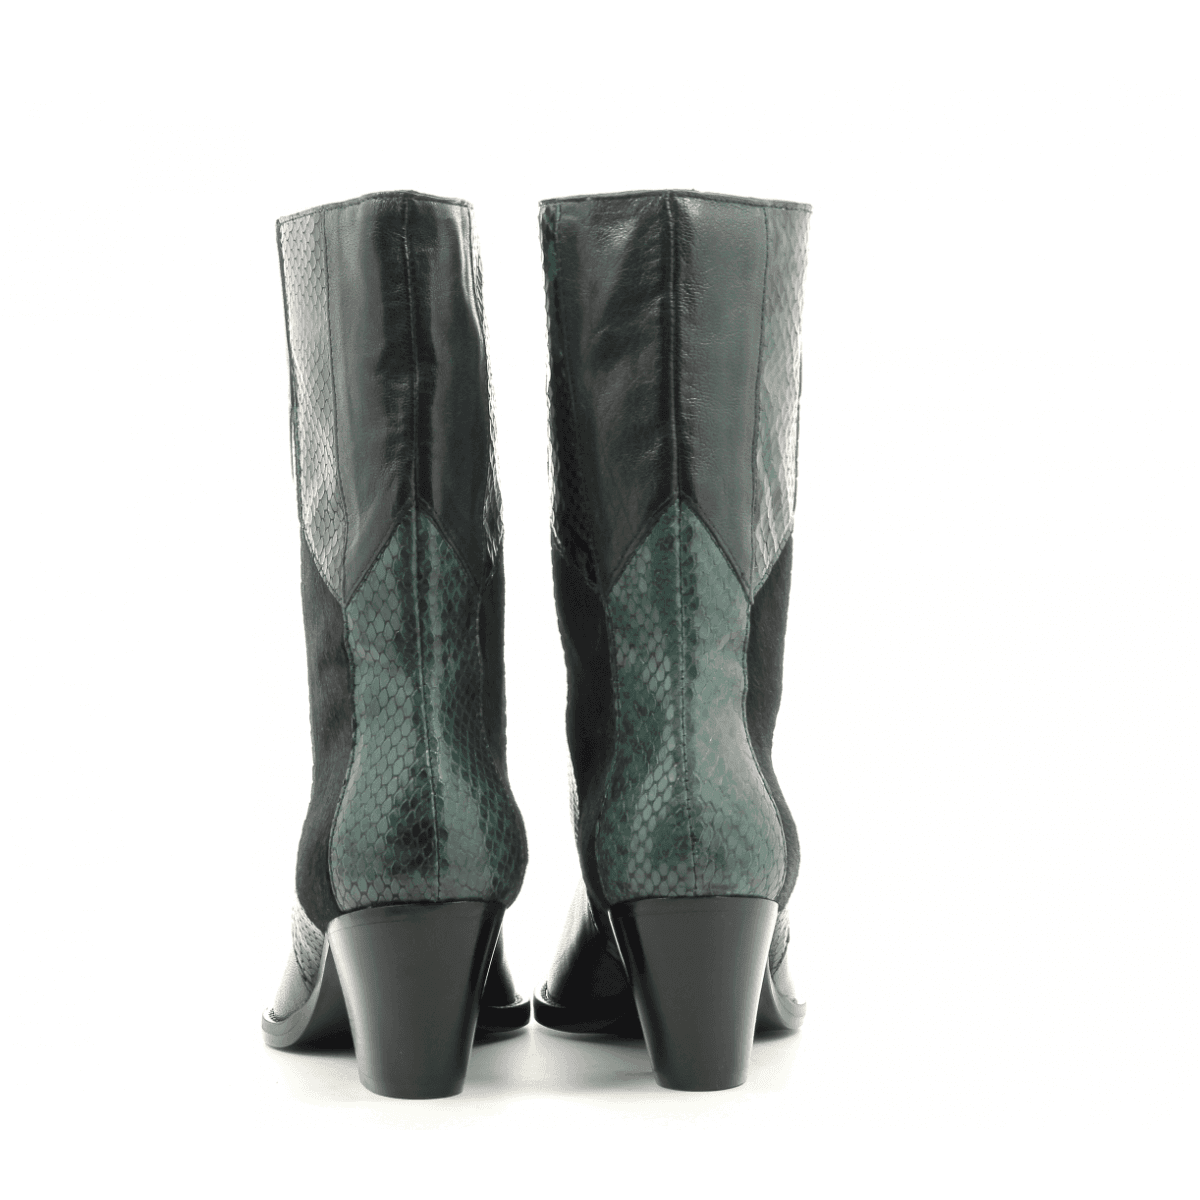 Bottines en patchwork de cuir vert Sélection Garrice  - AI19052V